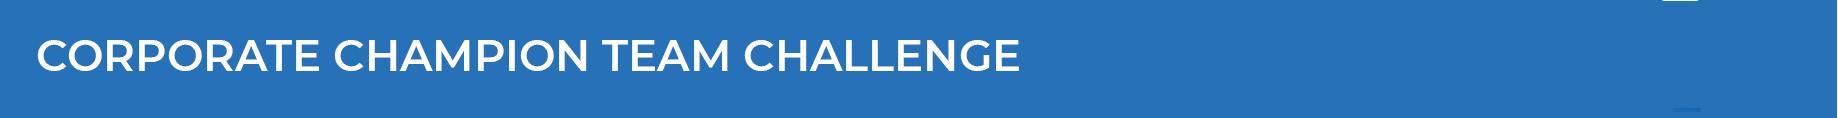 corporate champion team challenge - desktop